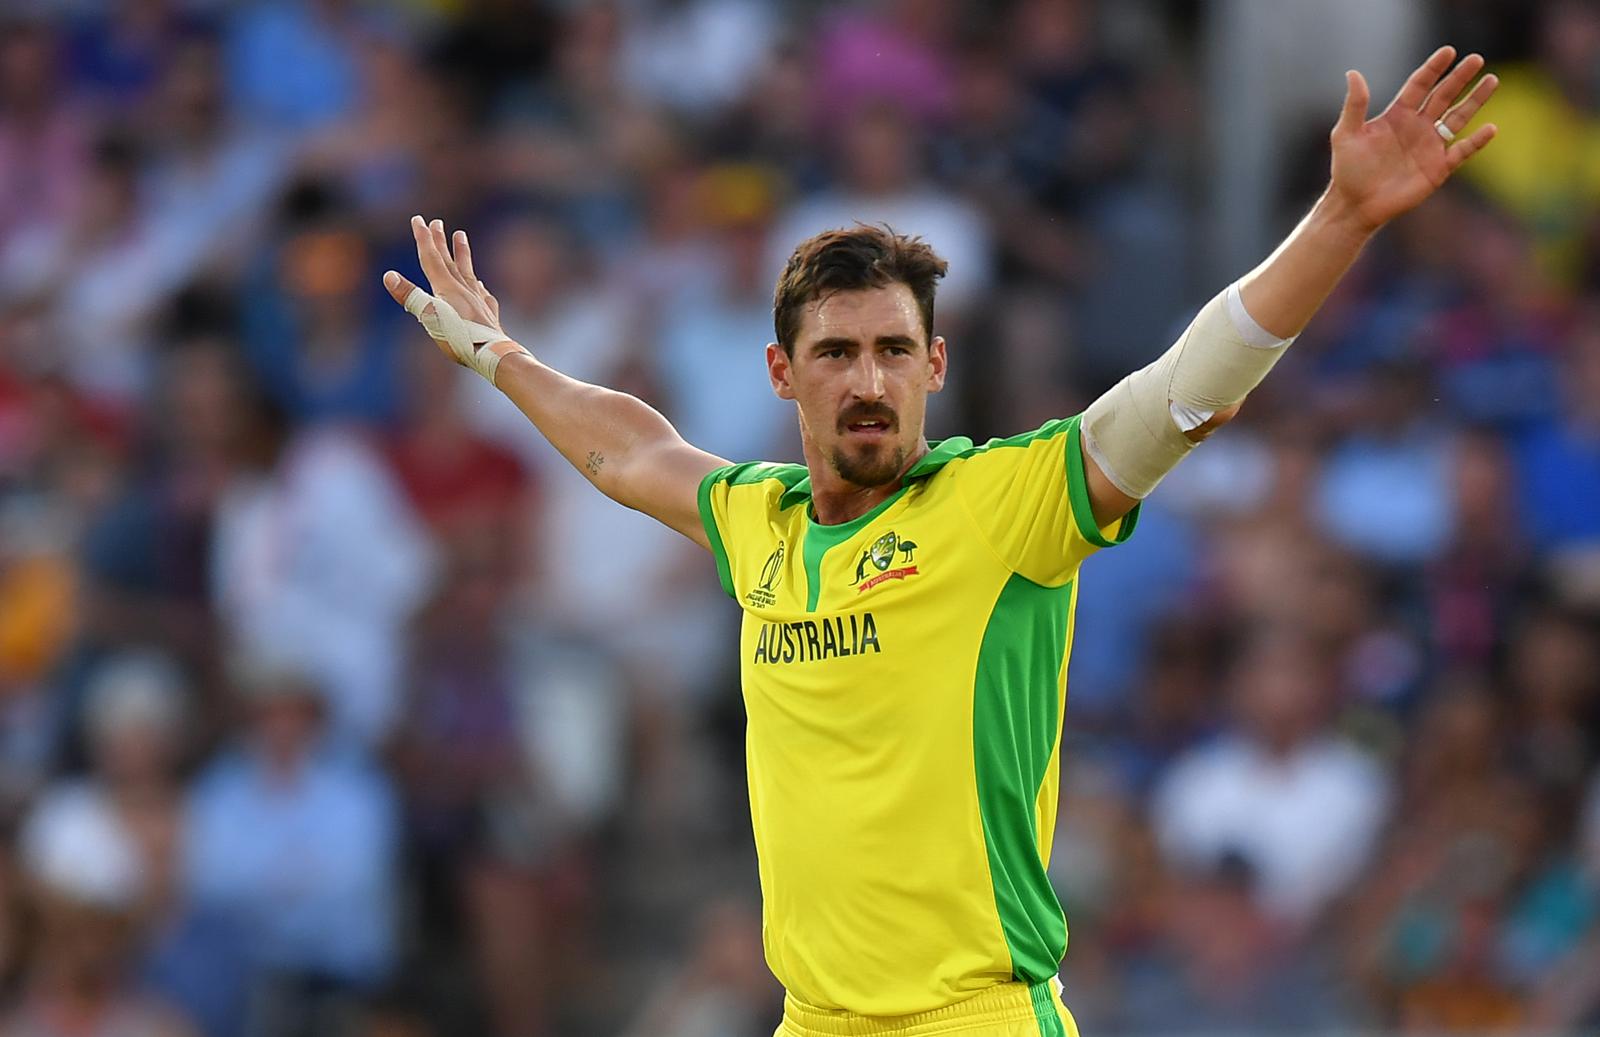 Injury helped Starc hit reset button: Haddin | cricket.com.au